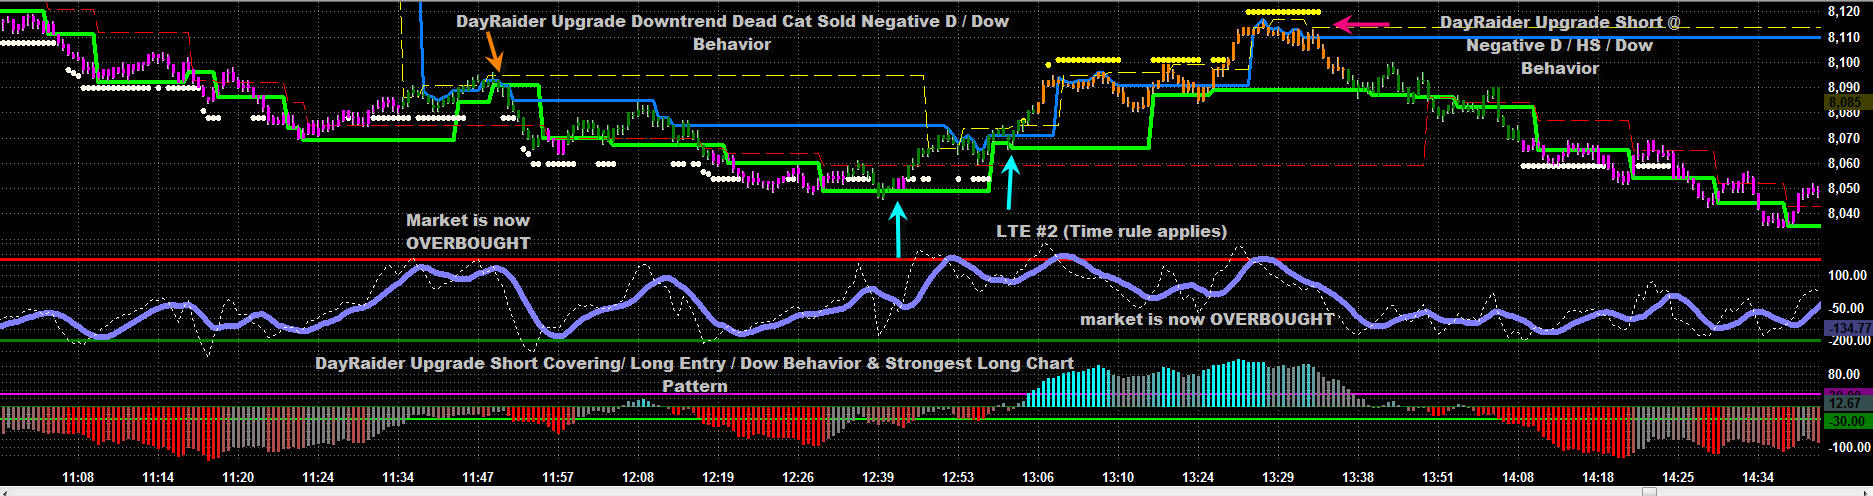 dru-downtrend-ends-trading-range-follows.jpg